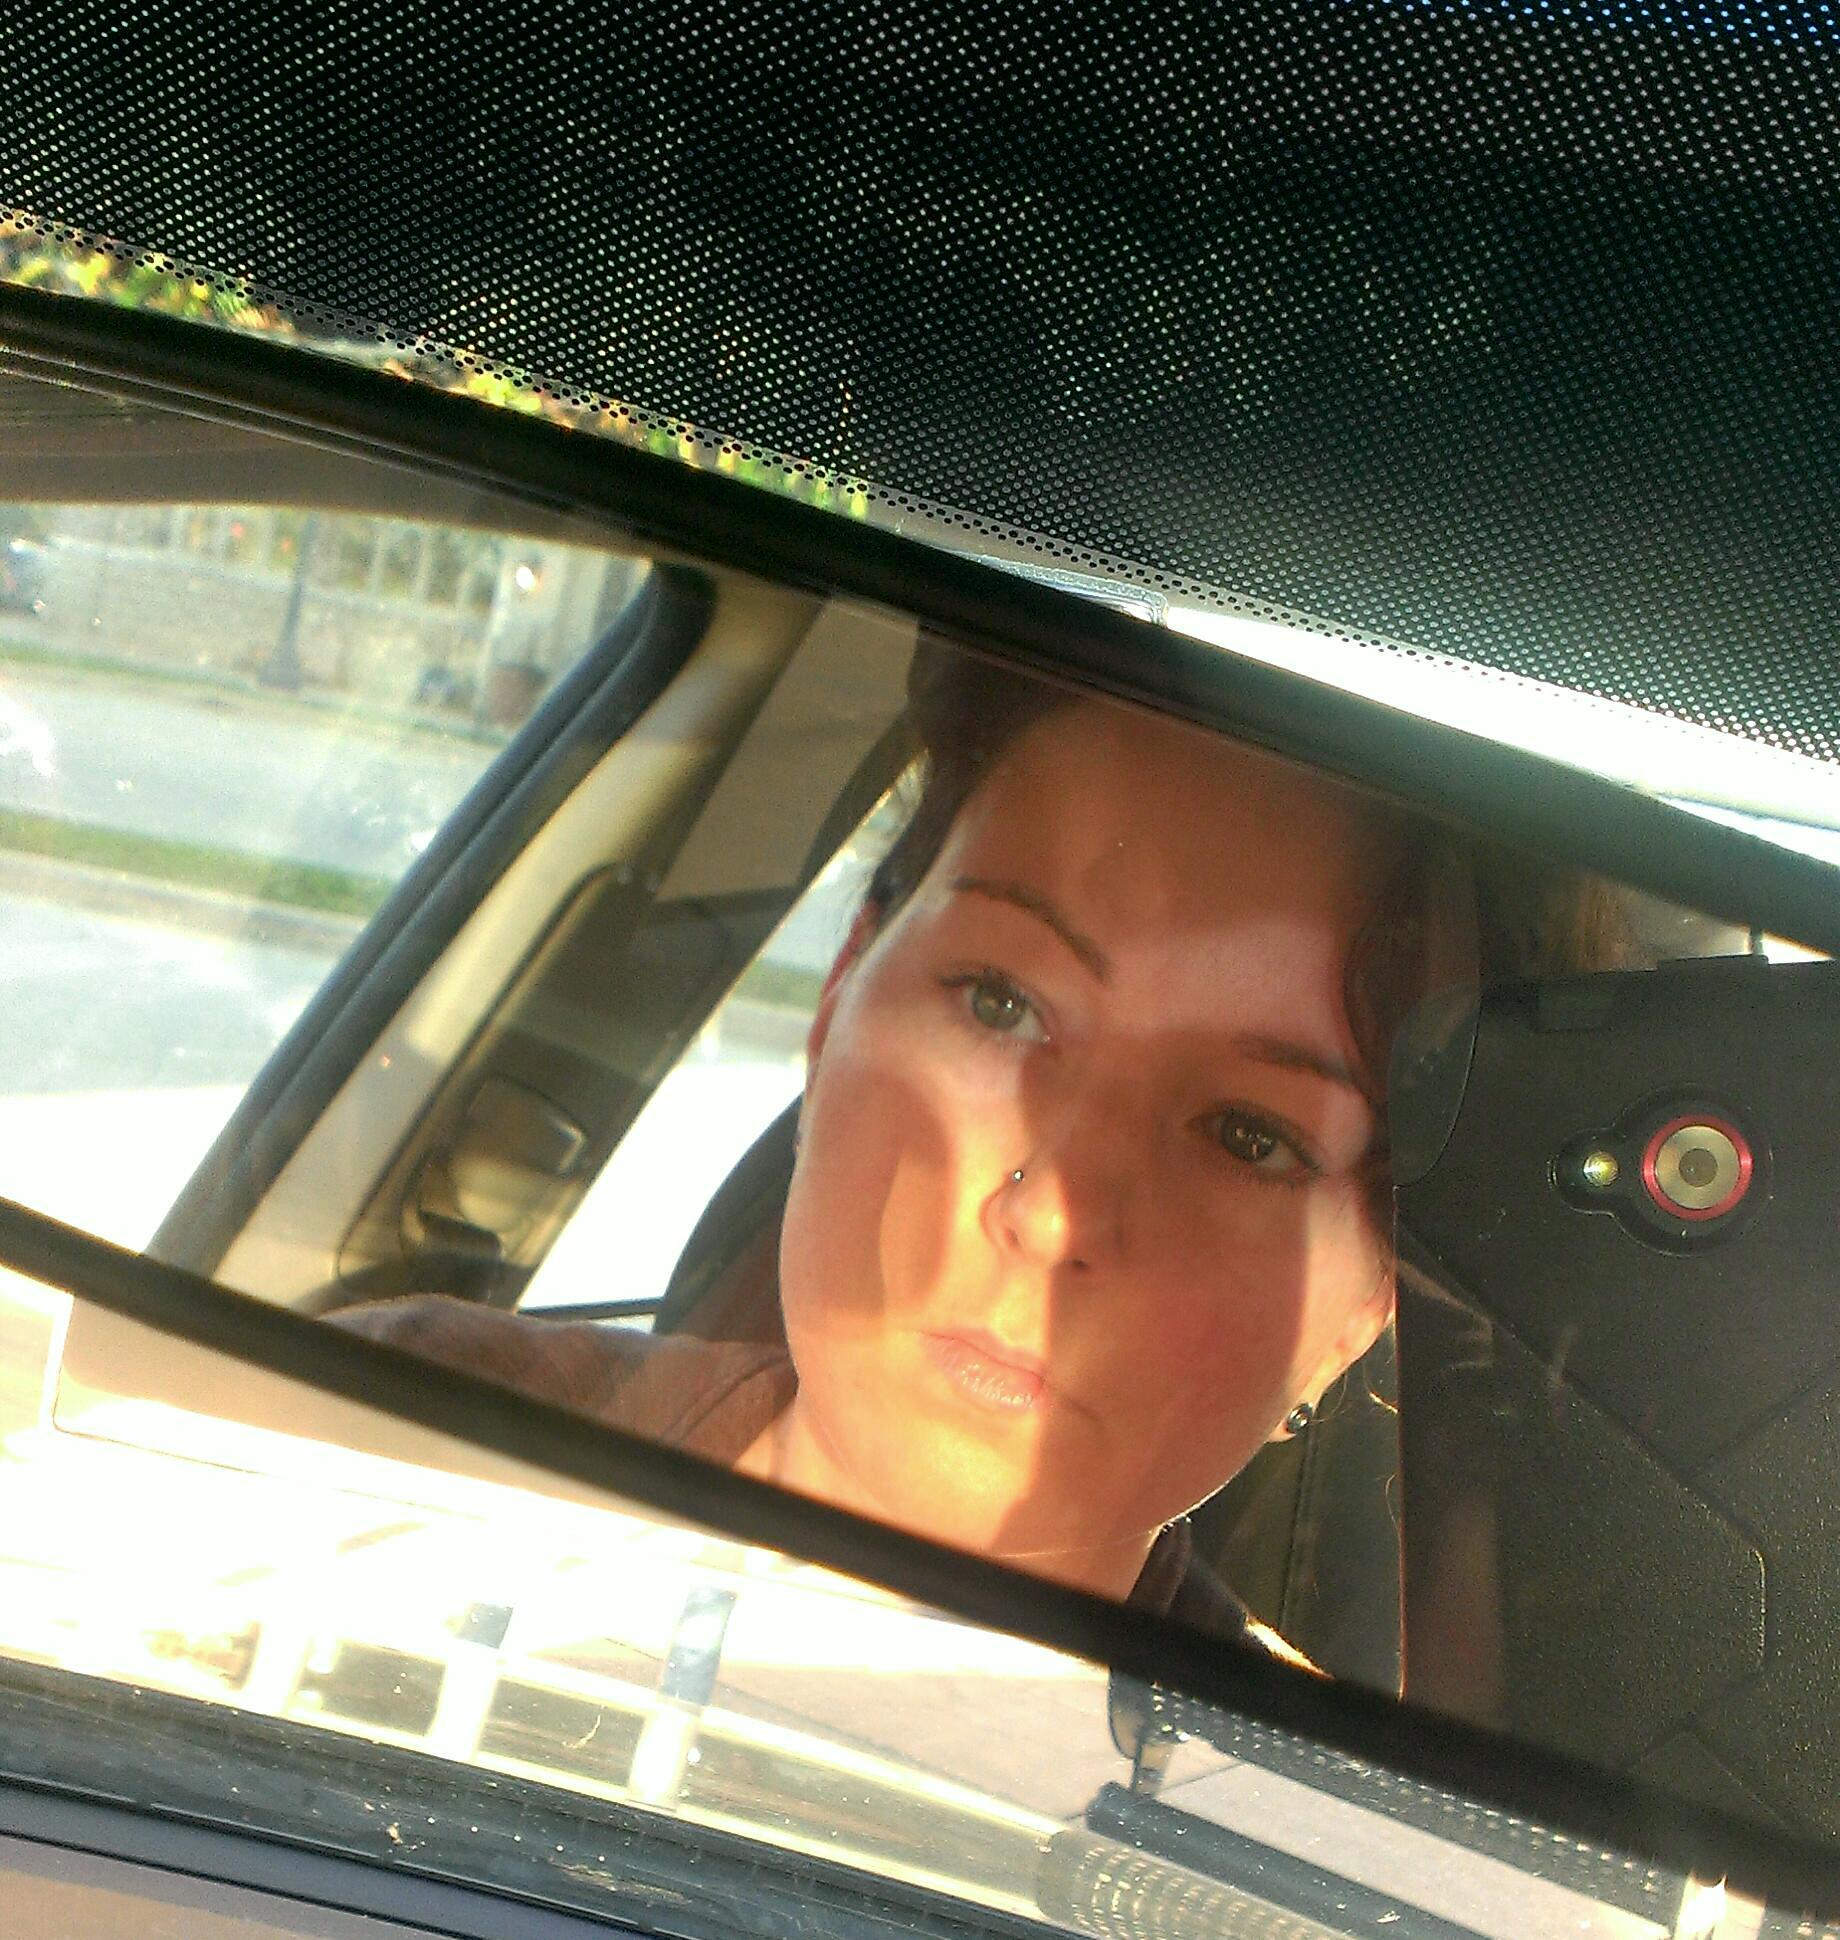 pensive rearview selfie